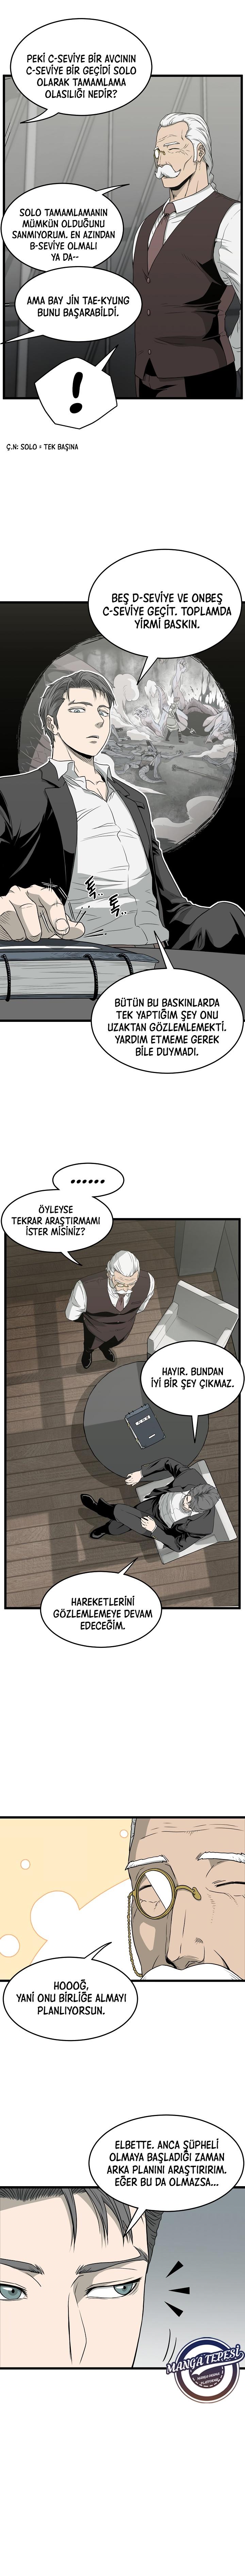 murim-loginbolum-49